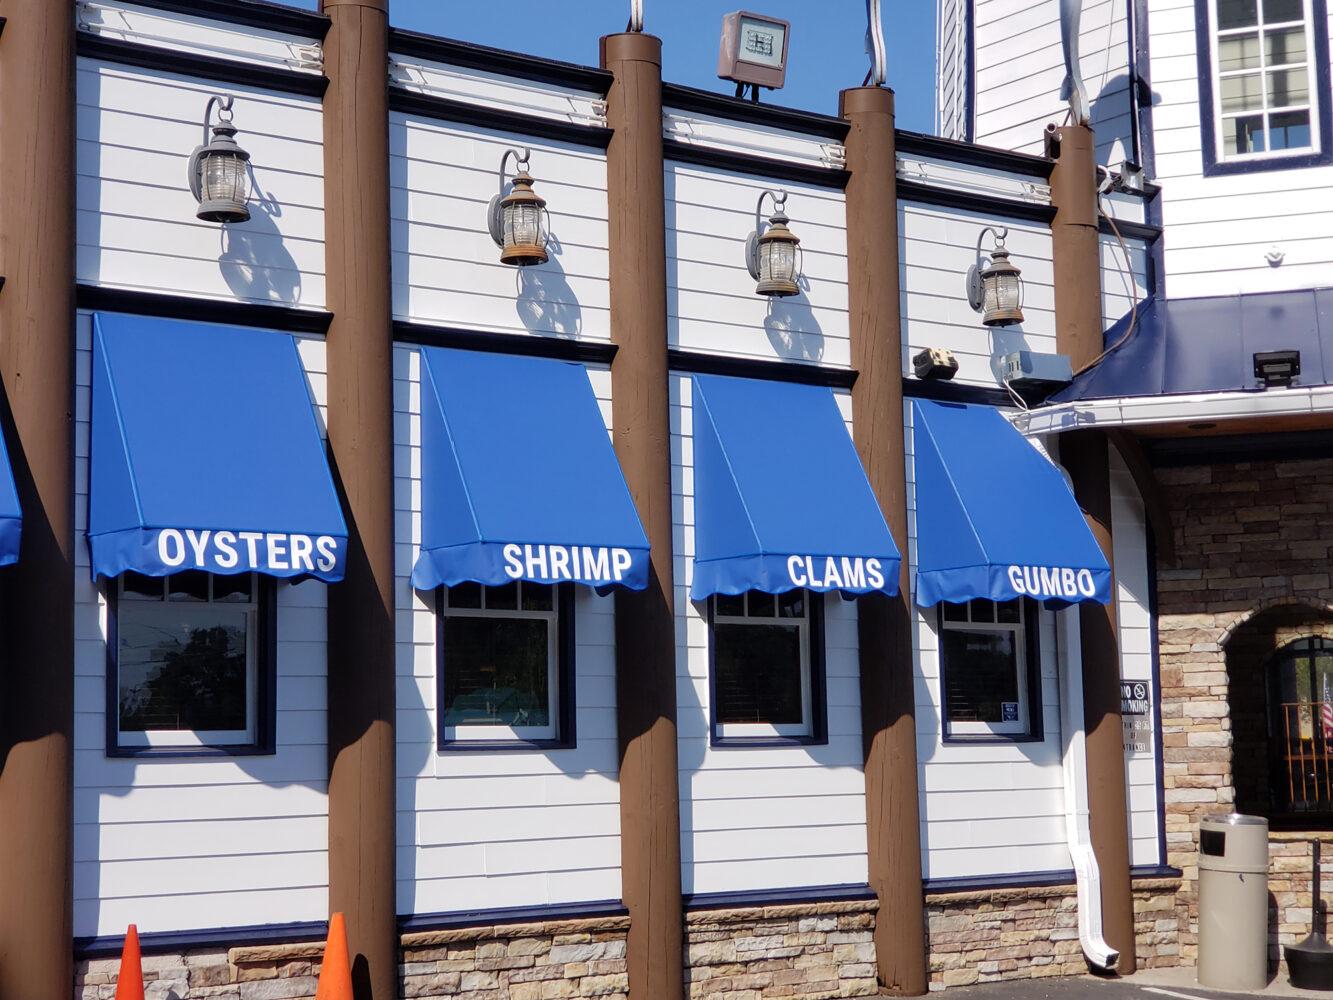 Marietta Fish Market custom awning in Weather Chek fabric